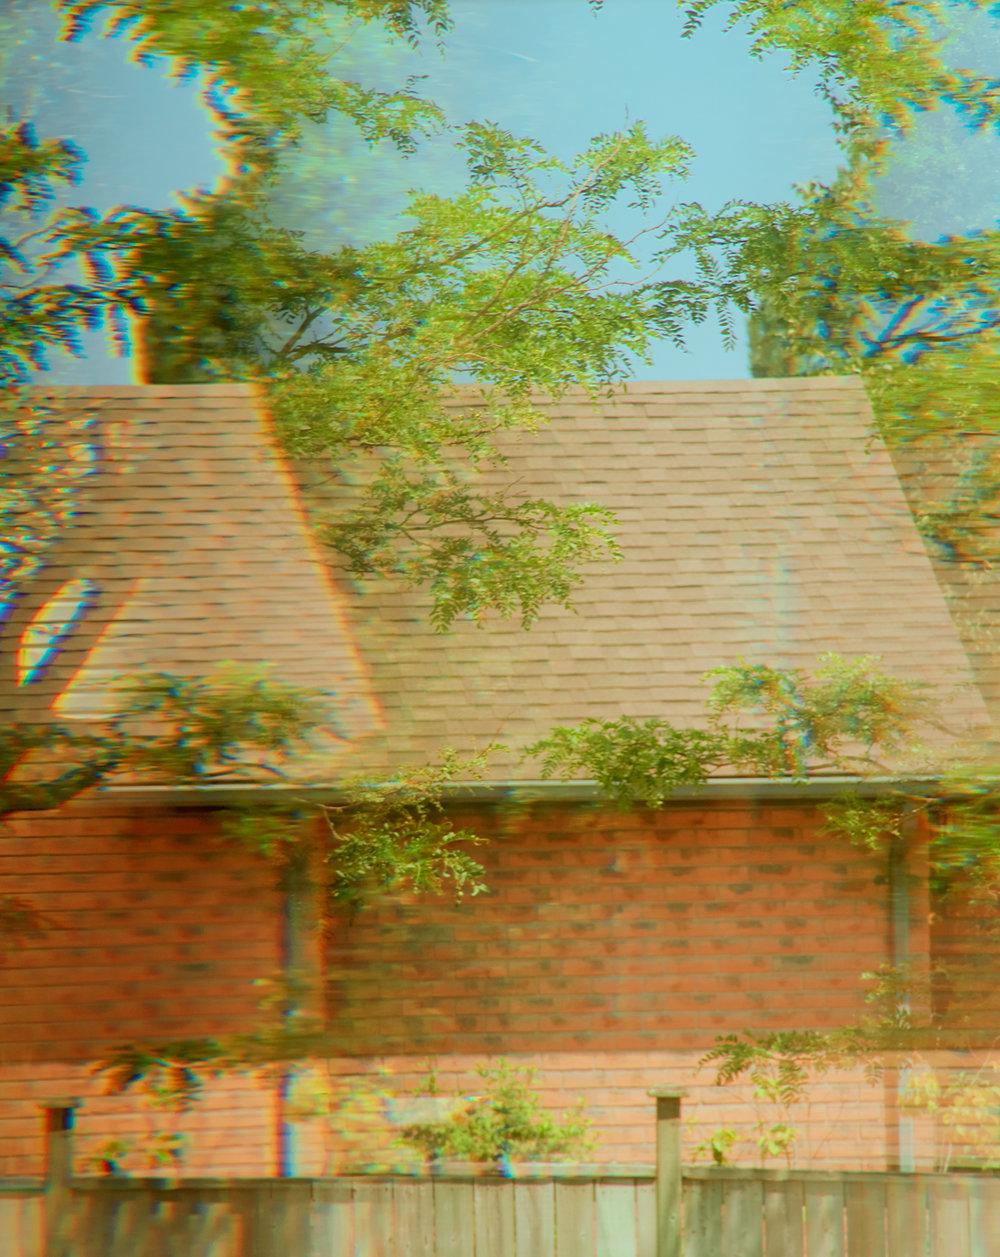 070418_DeepDream.jpg